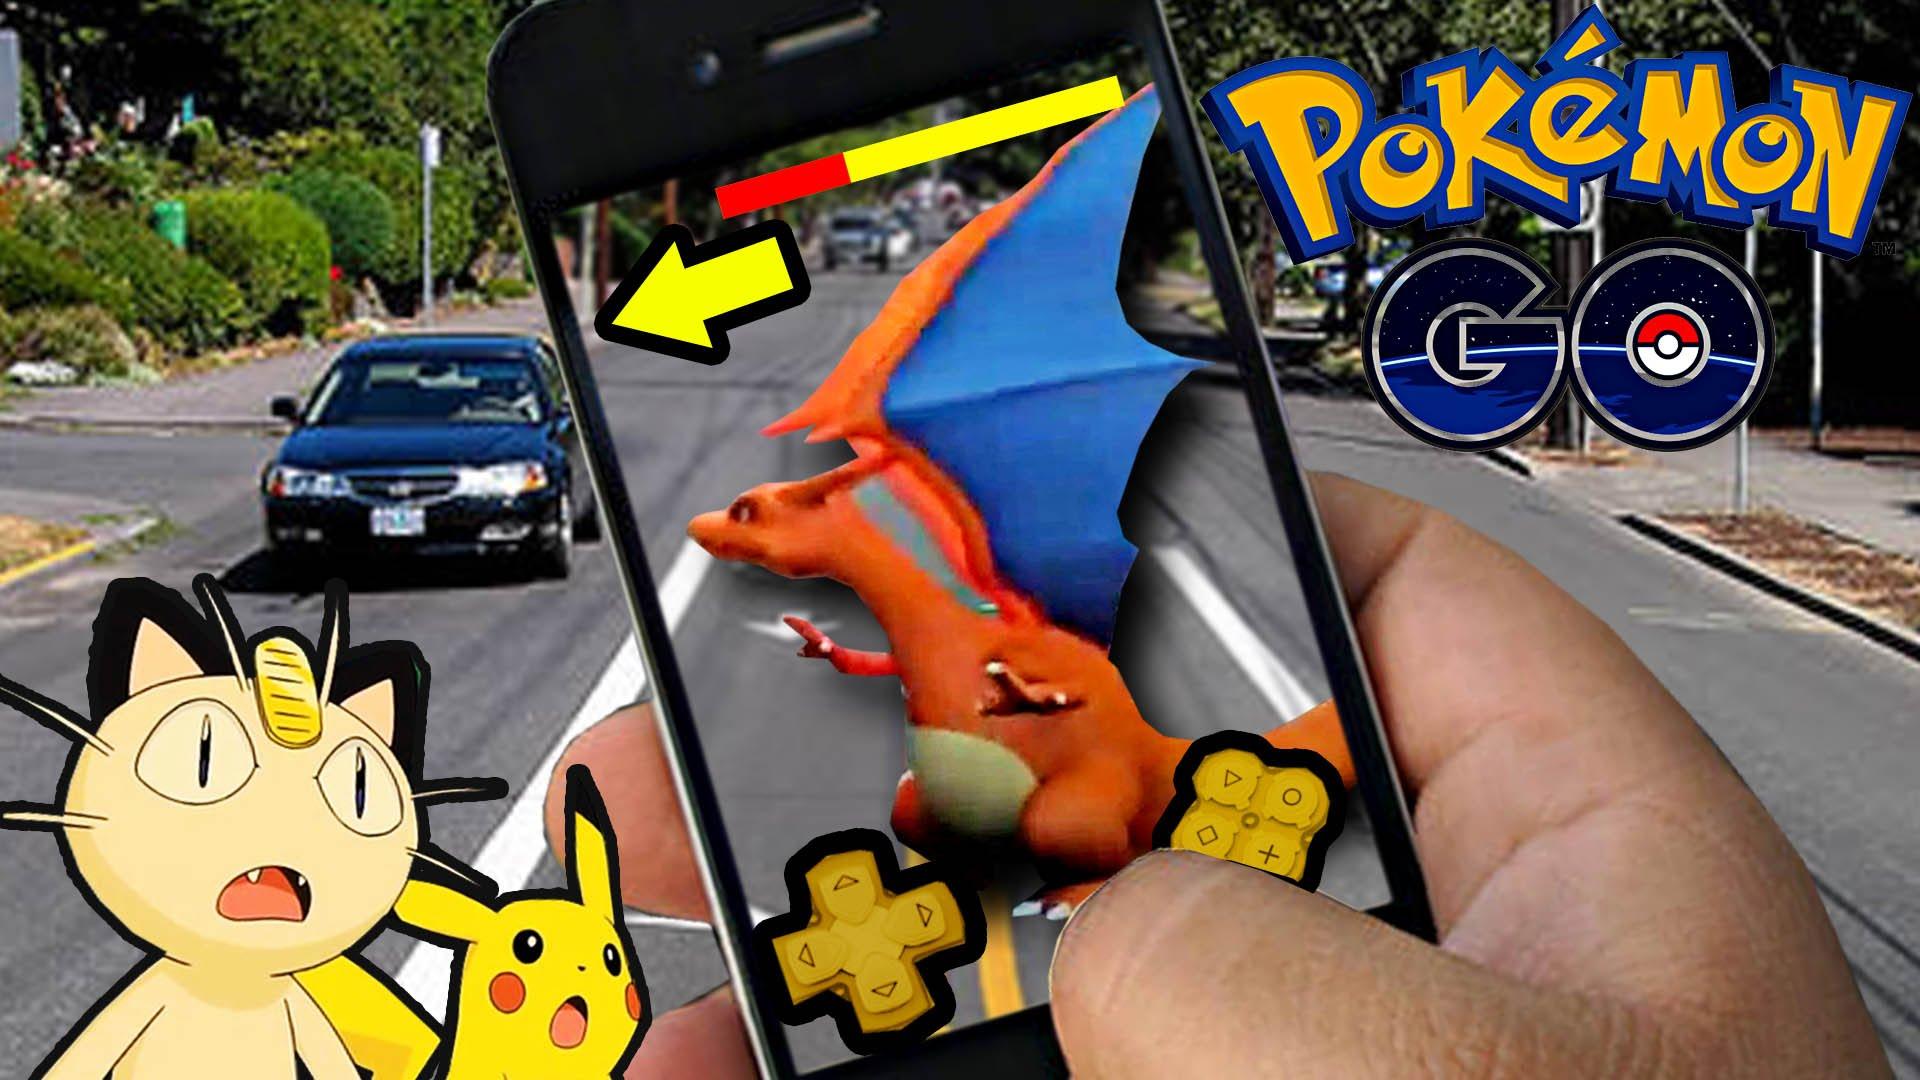 Pokémon Go - Capturando Charizard